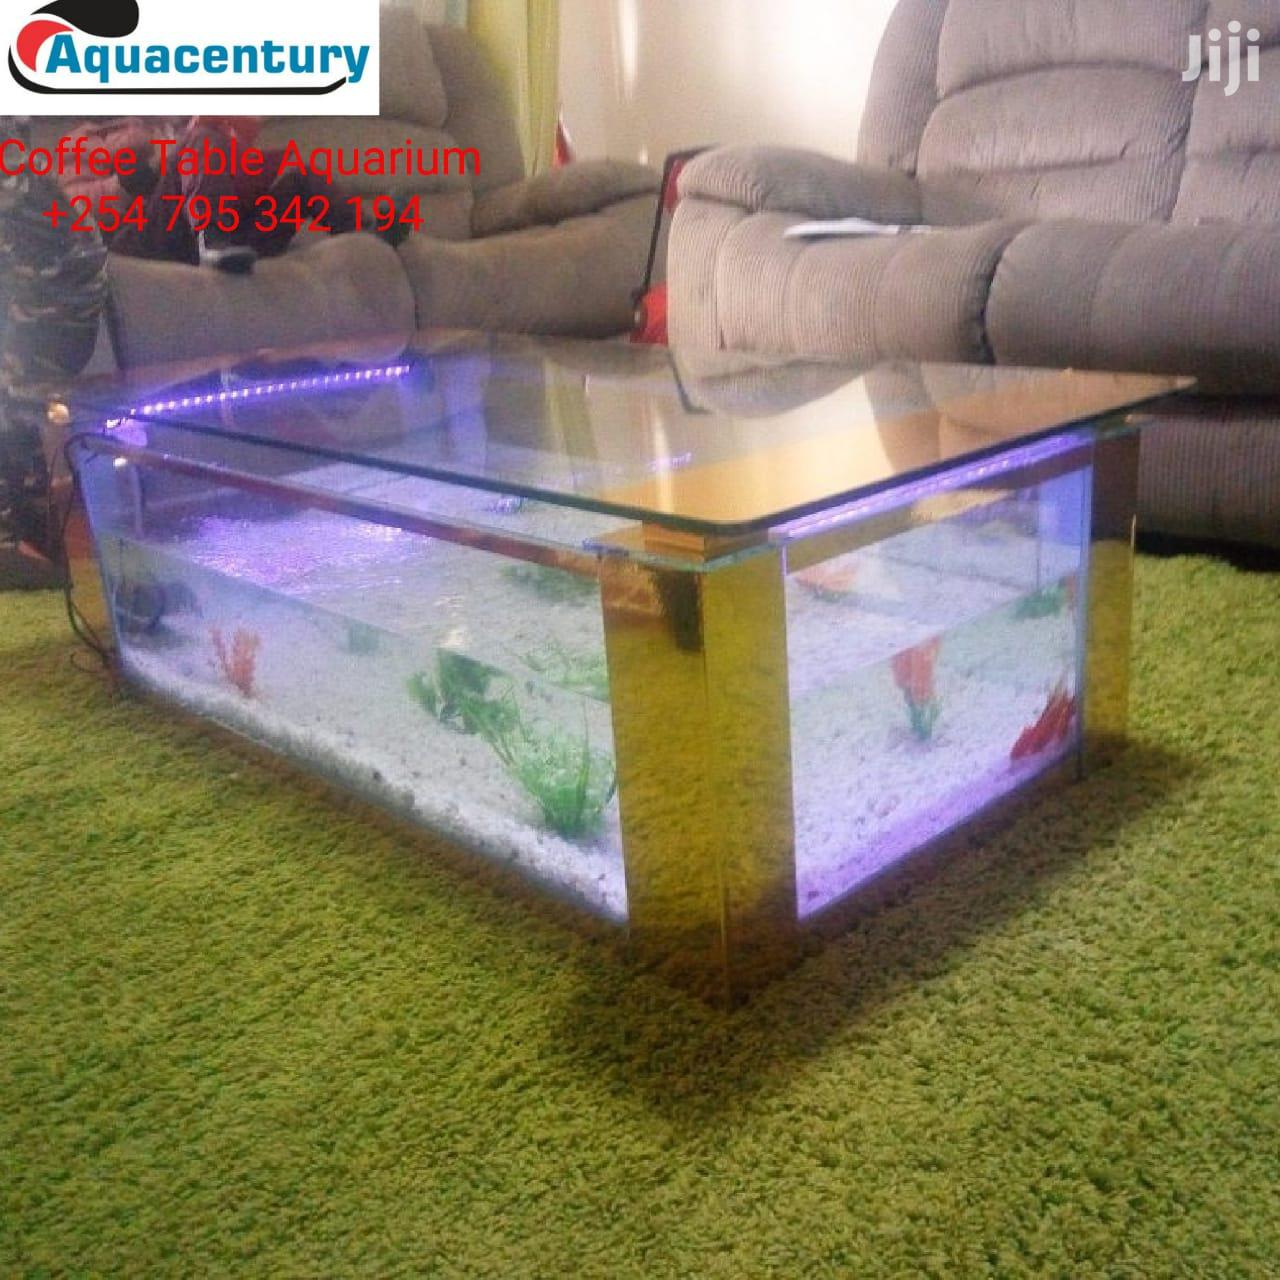 Coffee Table Aquarium | Fish for sale in Kamulu/Joska (Kasarani), Nairobi, Kenya